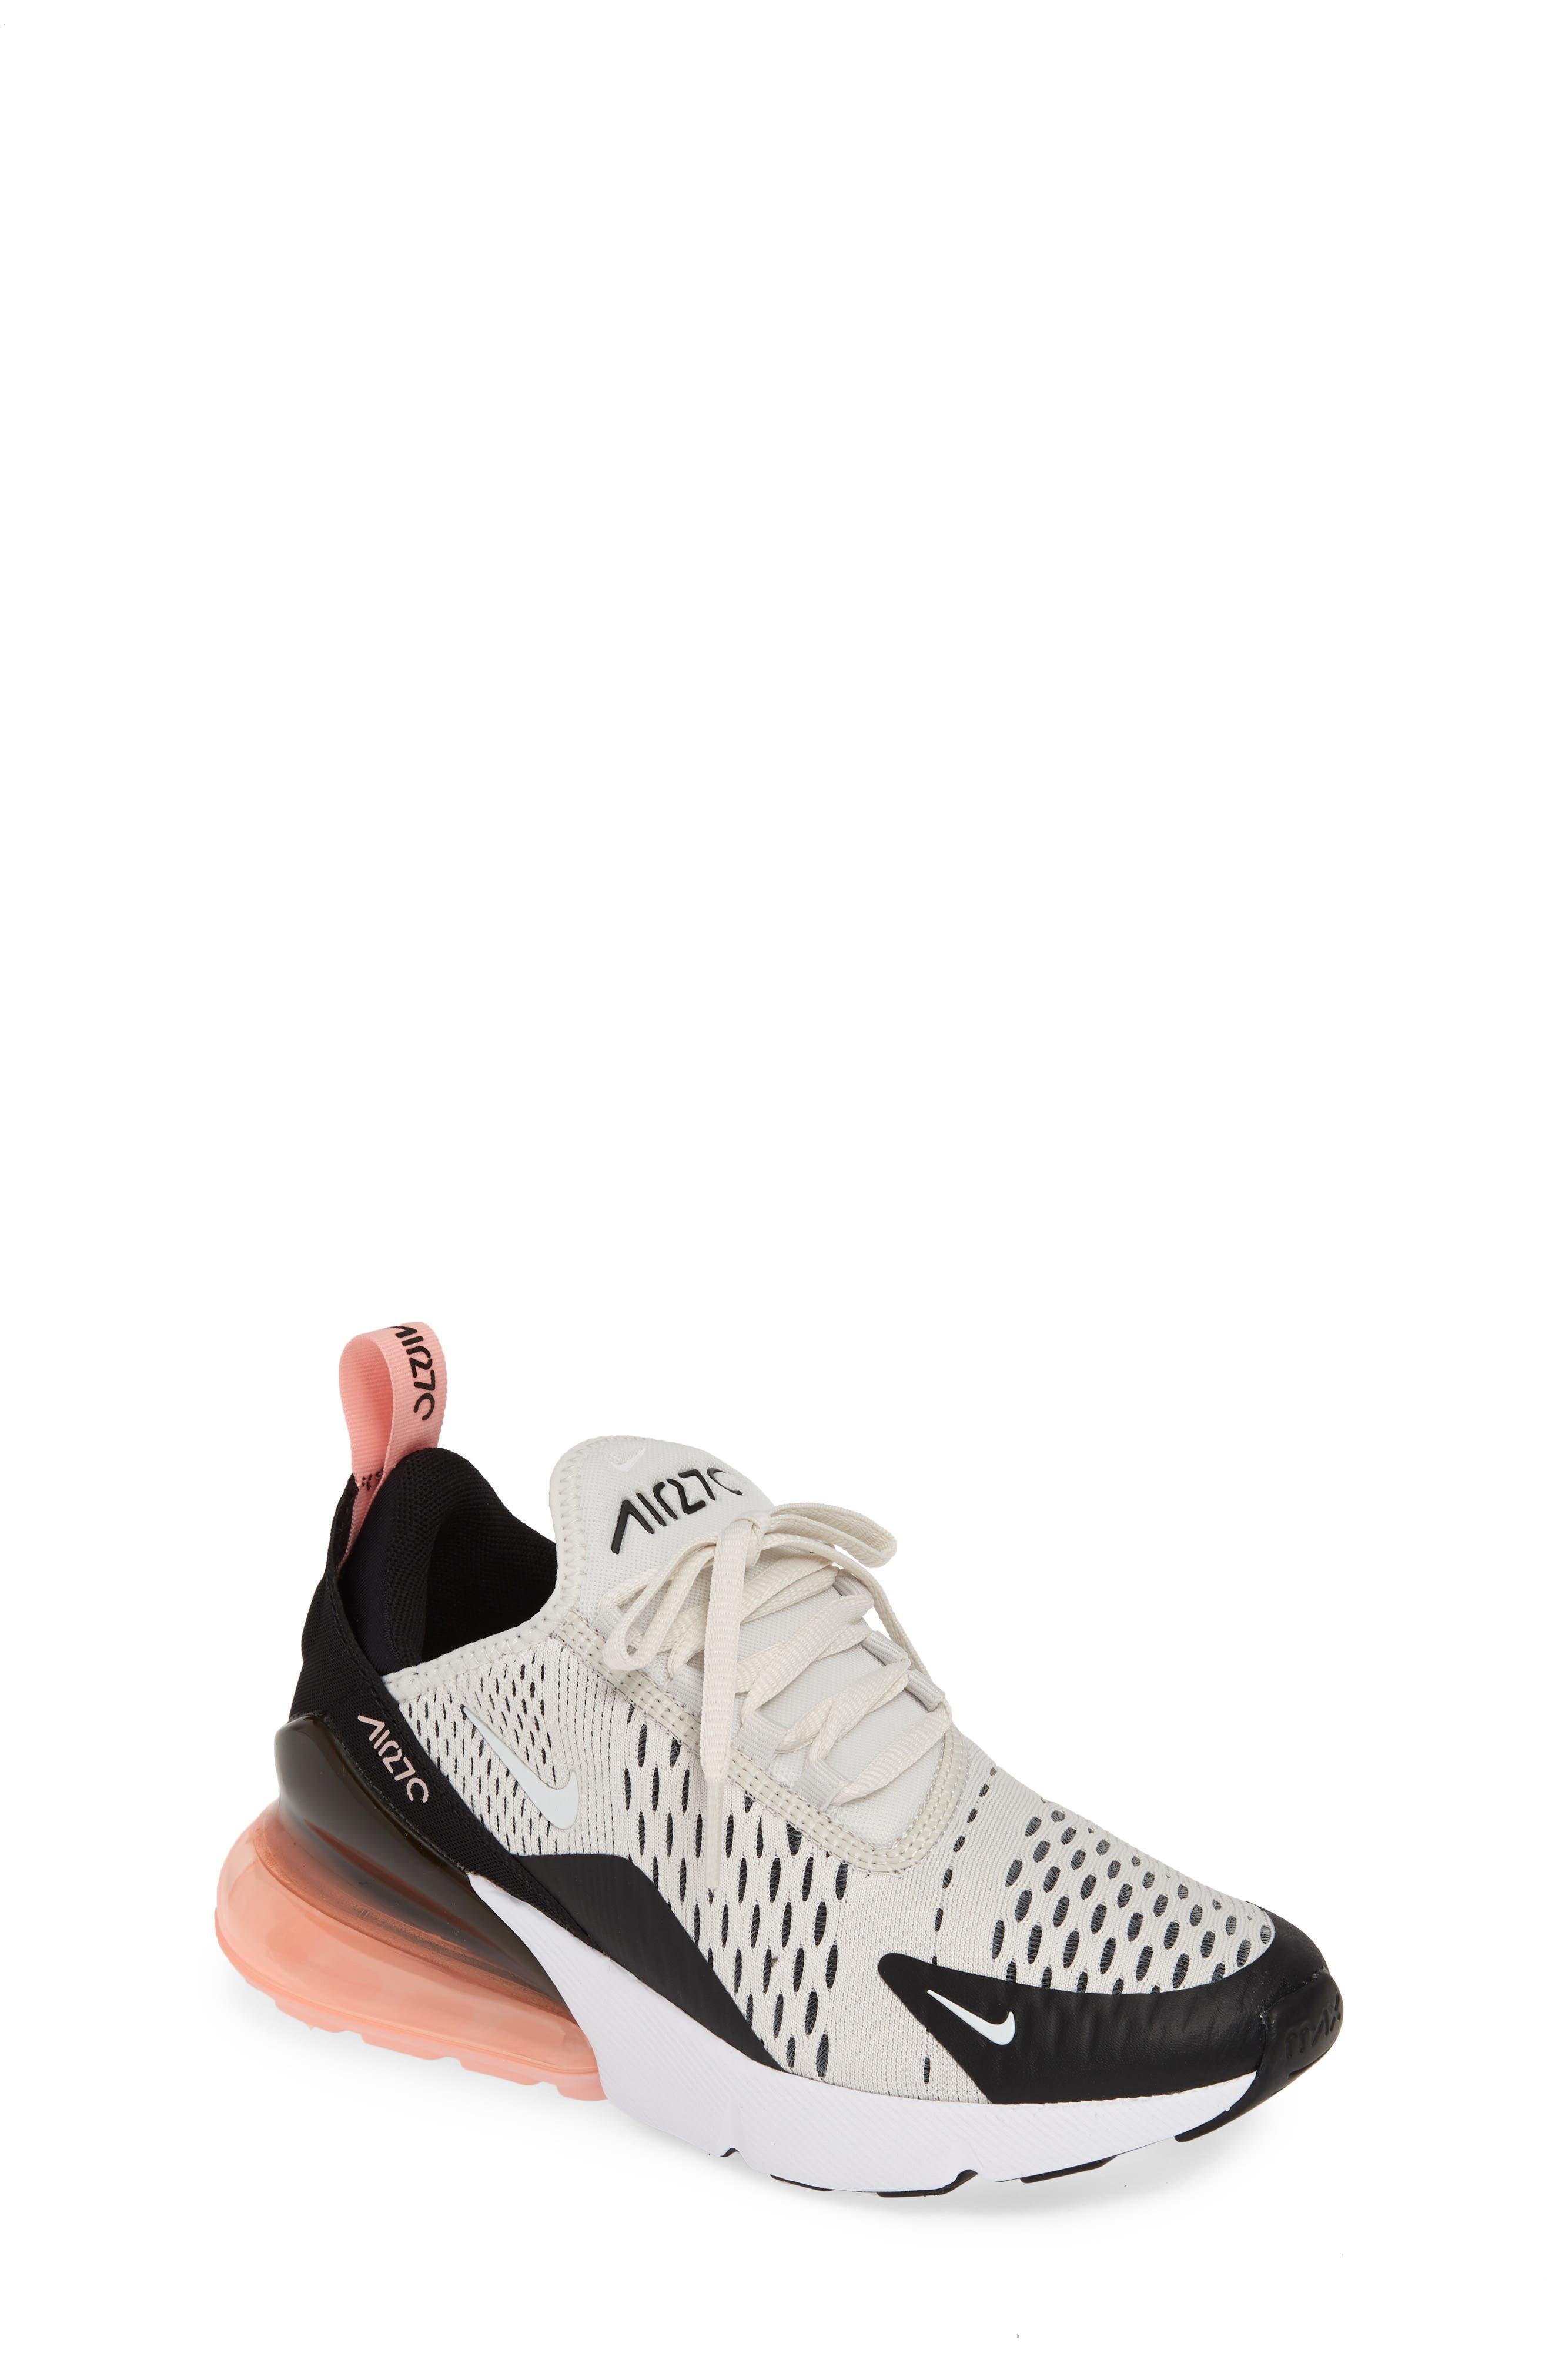 best service 31980 fea5f Kid s Nike Air Max 270 Sneaker- Metallic